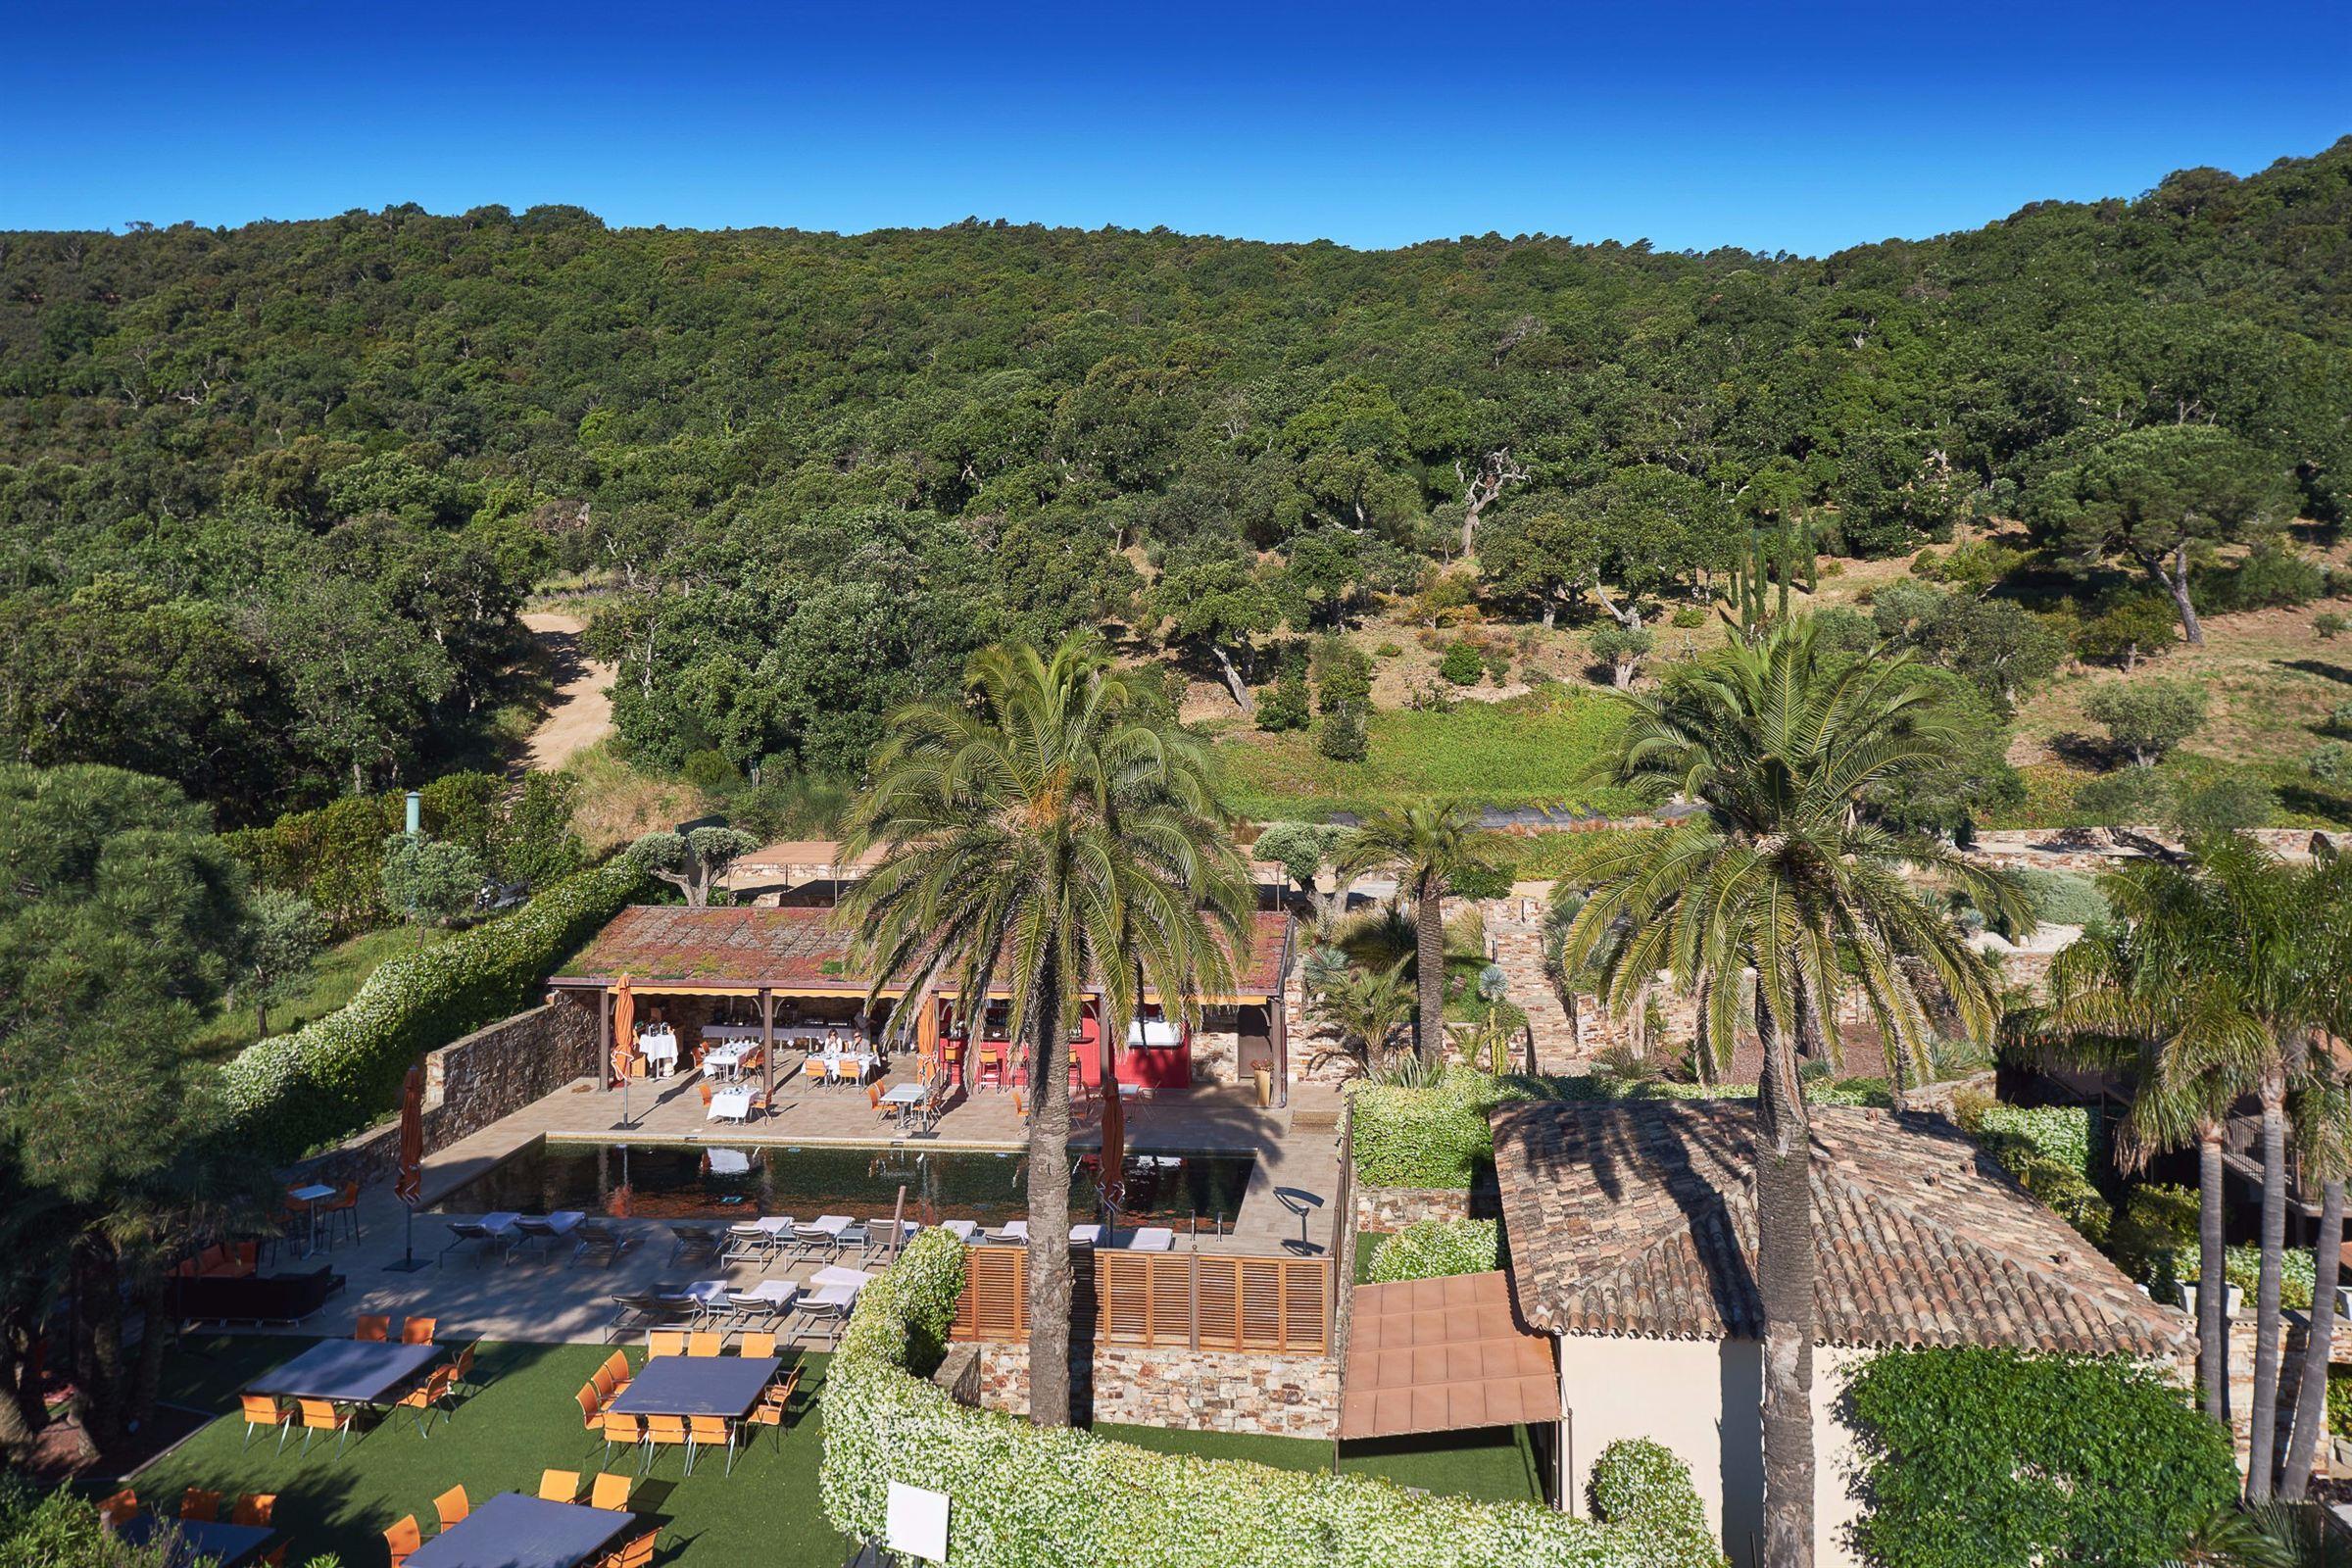 Single Family Home for Sale at Sumptuous Provencal-style bastide close to Ramatuelle Ramatuelle, Provence-Alpes-Cote D'Azur, 83350 France